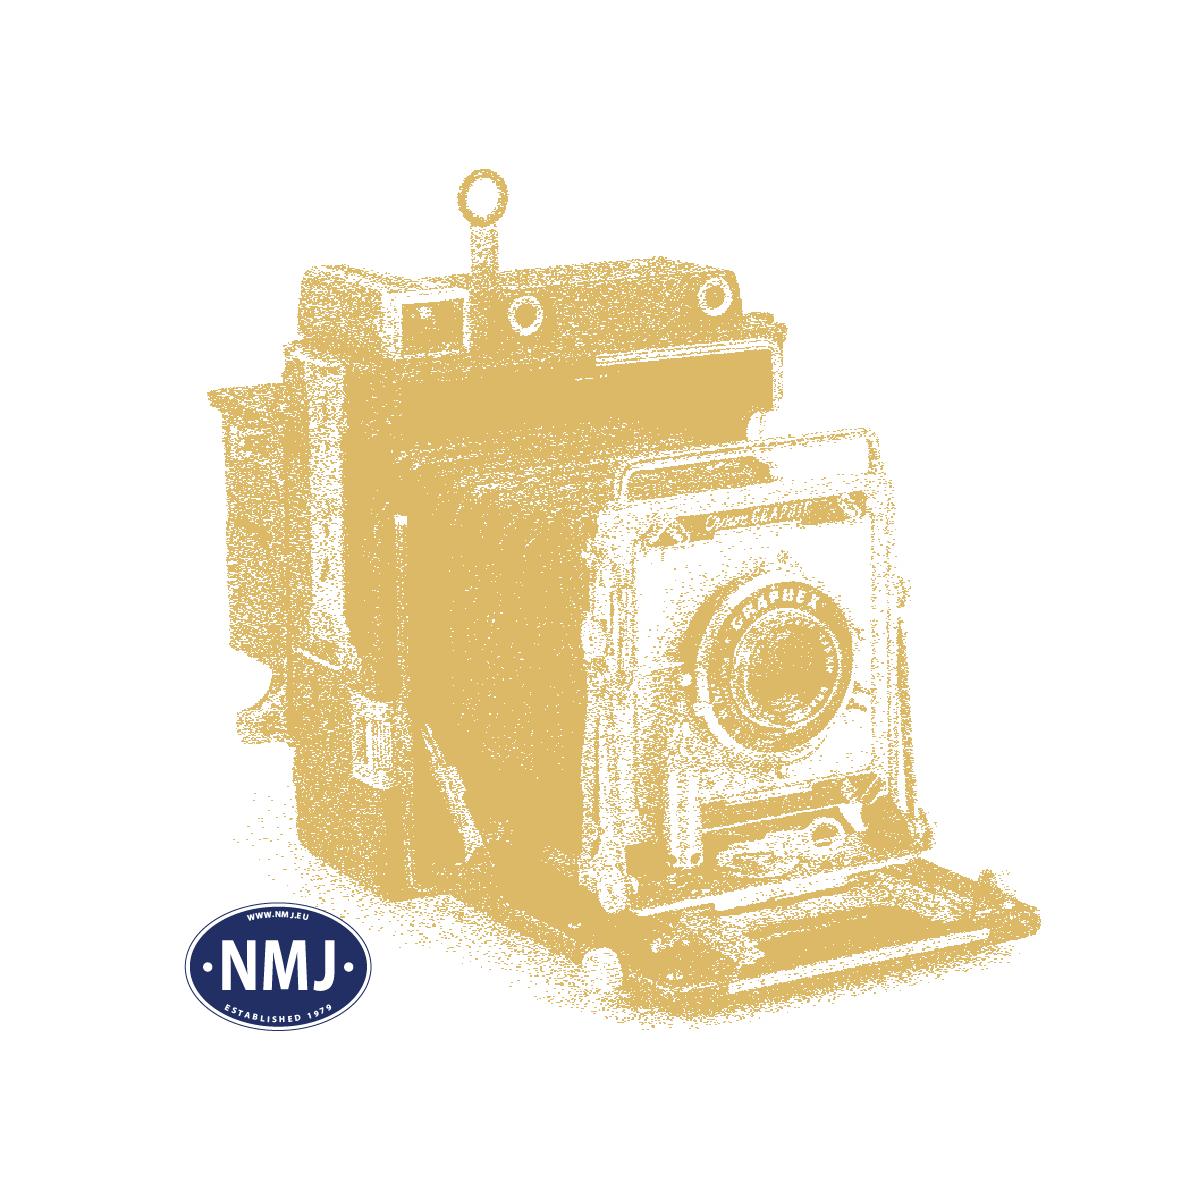 NMJT90101 - NMJ Topline DSB MY 1108, Nohab DC